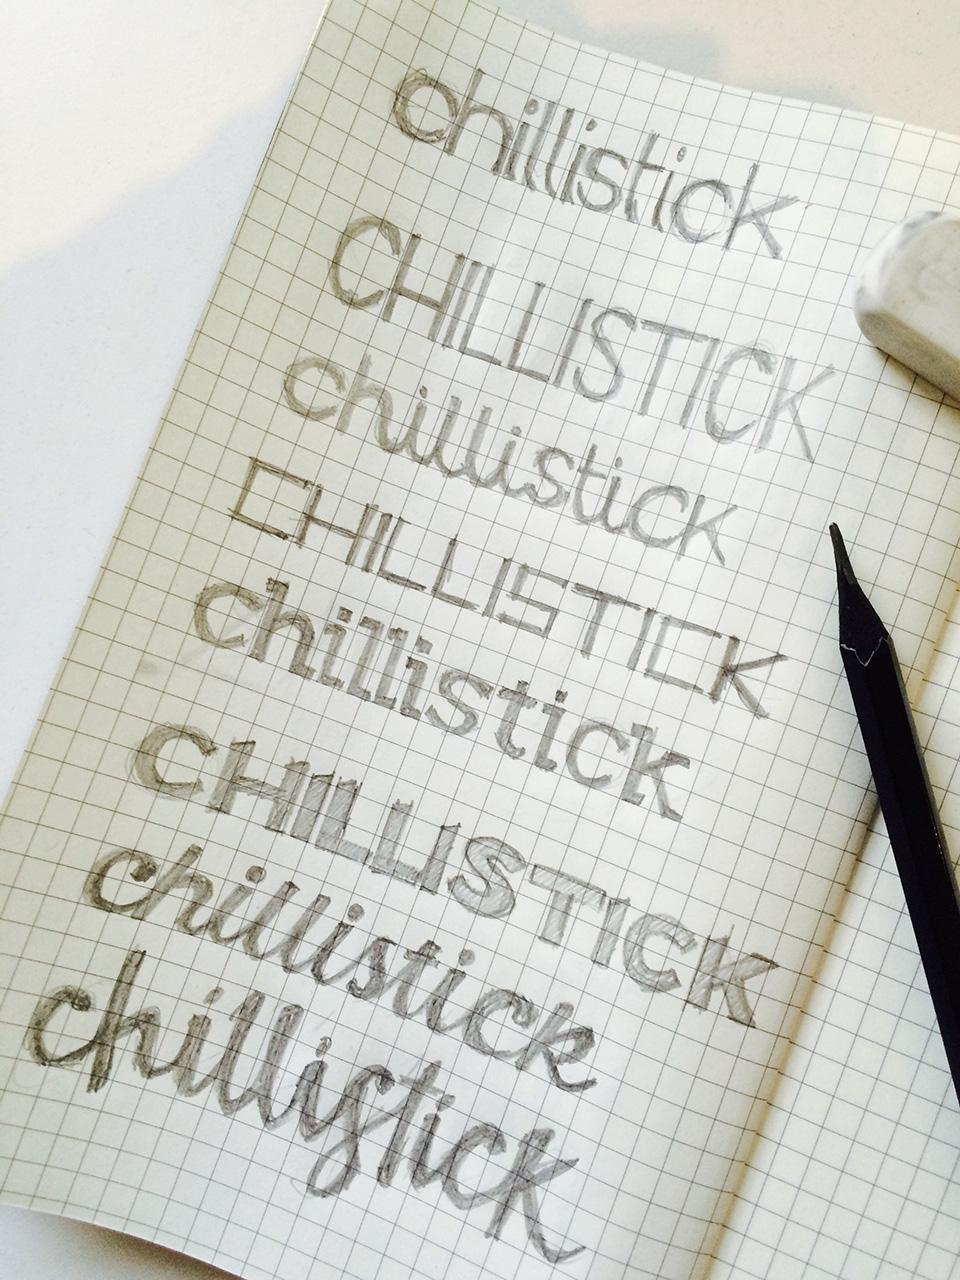 chillistick-logo_sketches